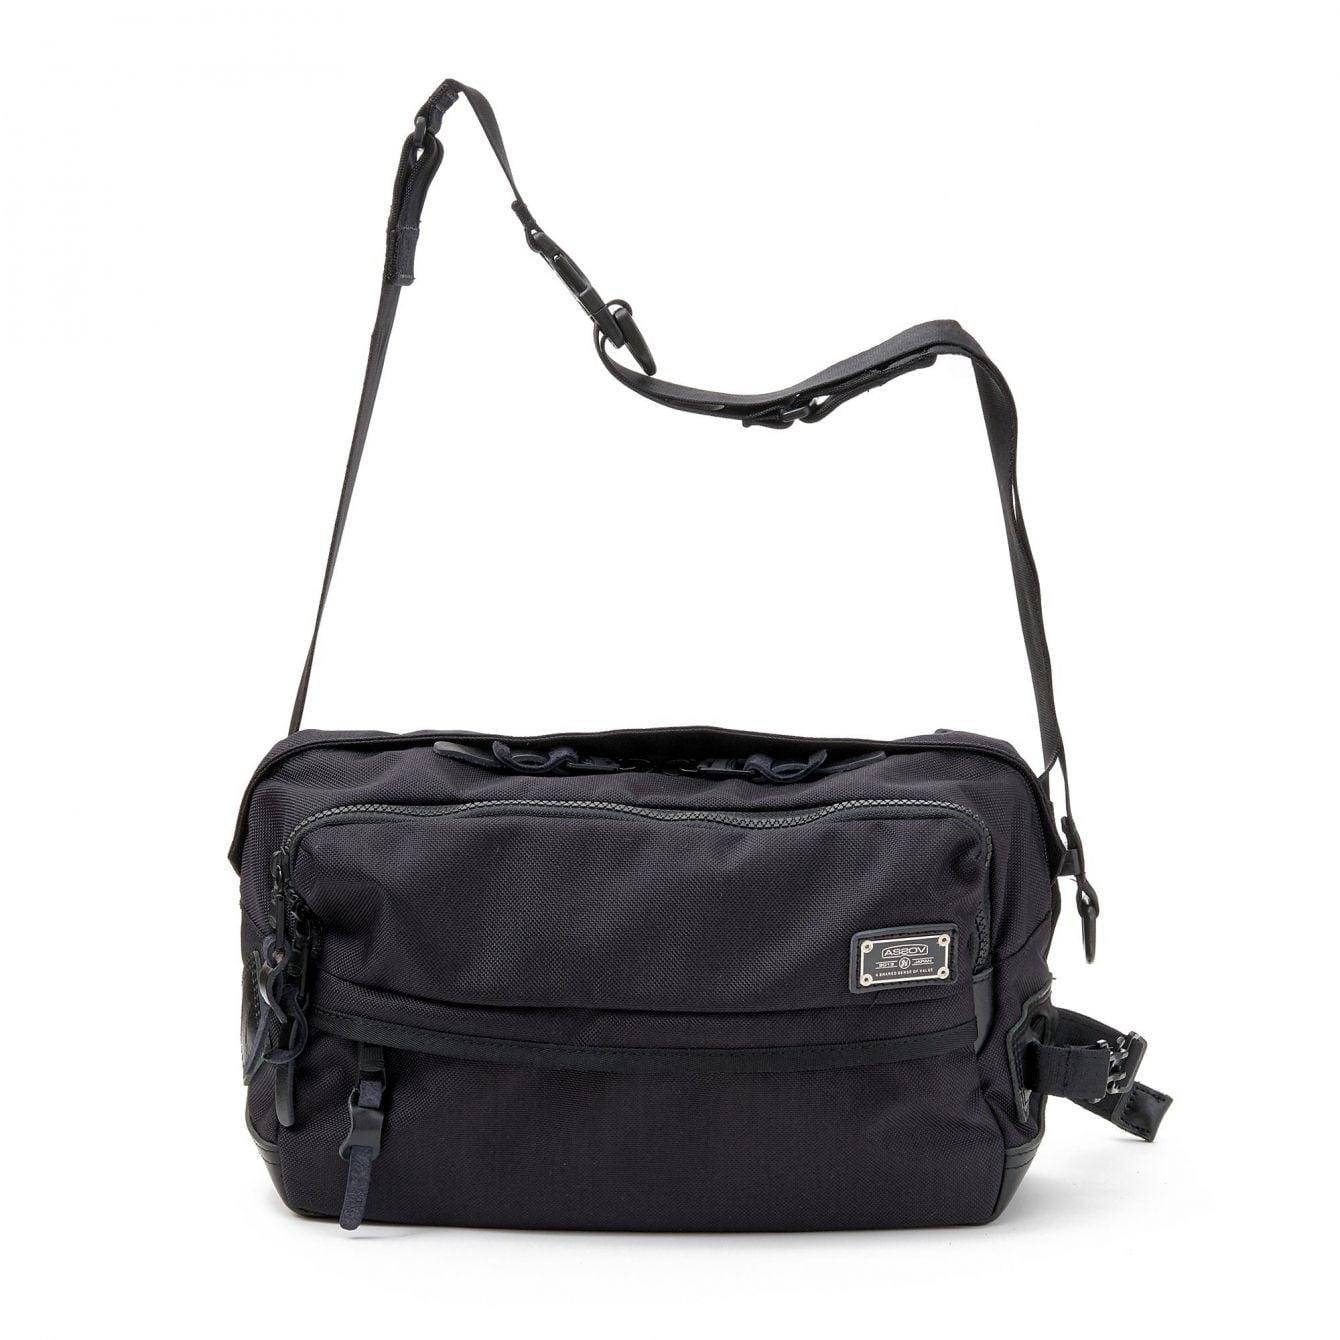 # 「AS2OV」包袋品牌獨家彈道尼龍:2WAY SHOULDER & BODY BAG 新品上市 13